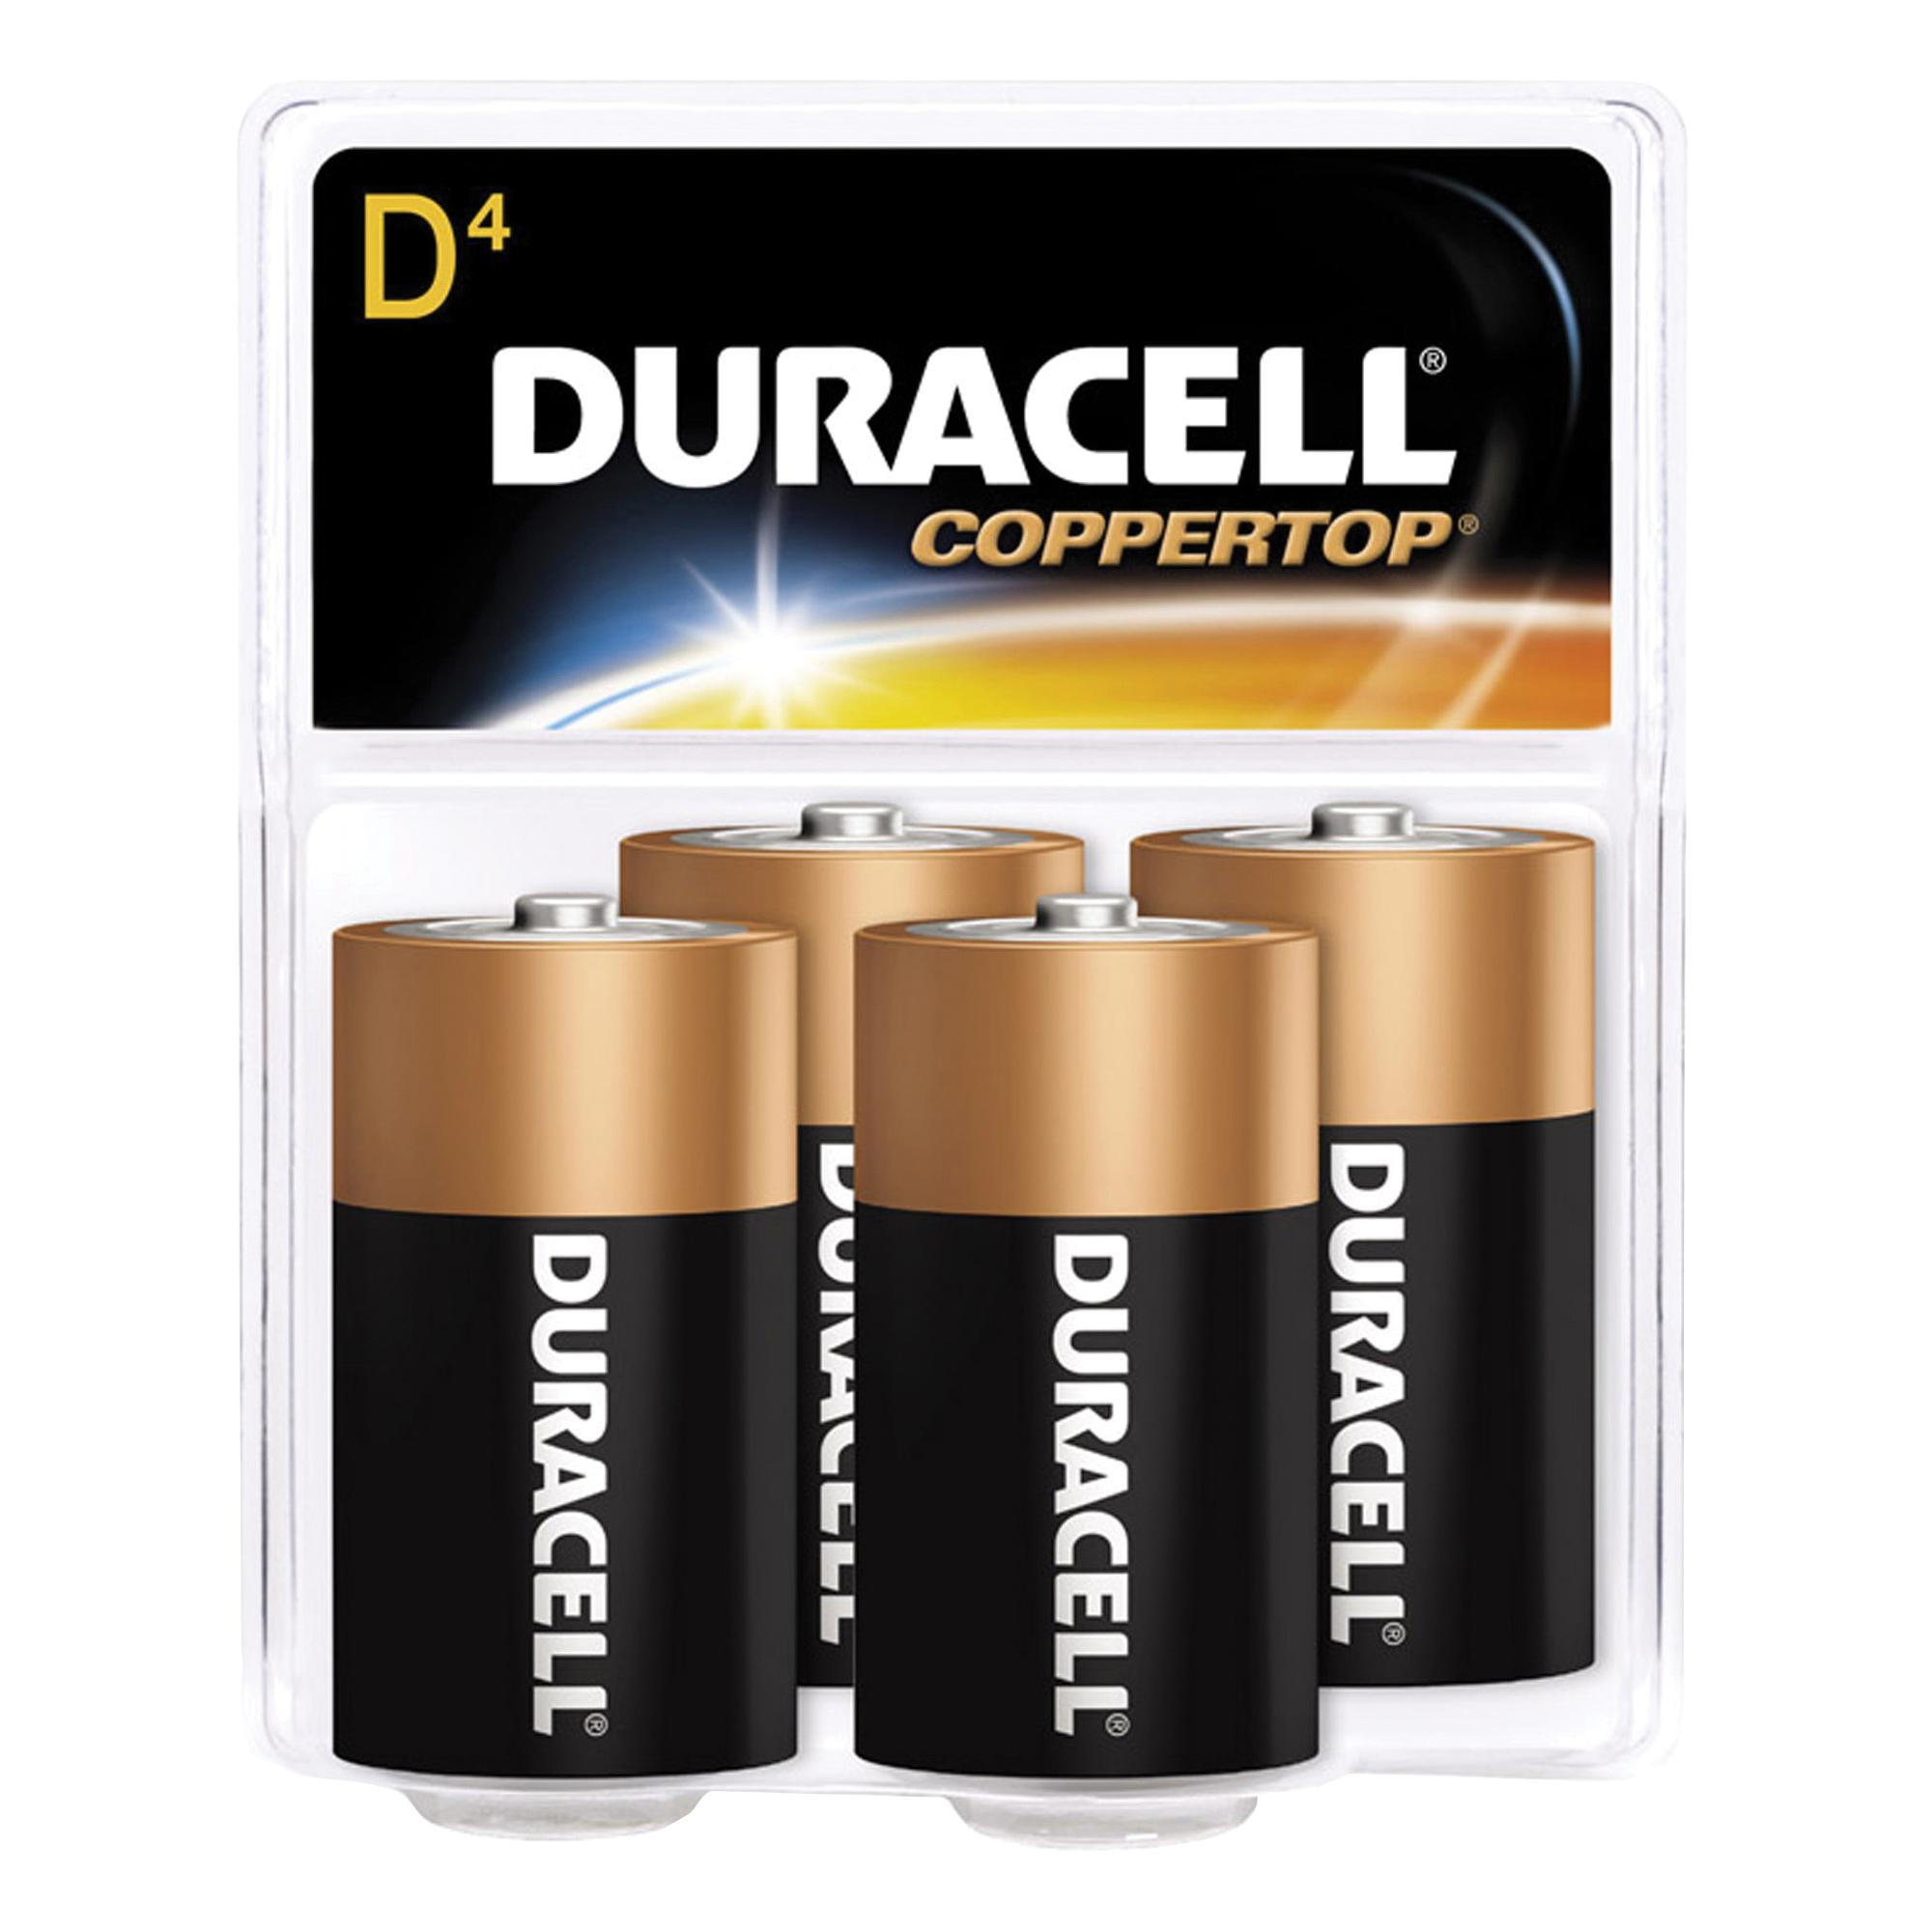 Picture of DURACELL MN1300R4Z Alkaline Battery, 1.5 V Battery, 14 Ah, D Battery, Manganese Dioxide, Black